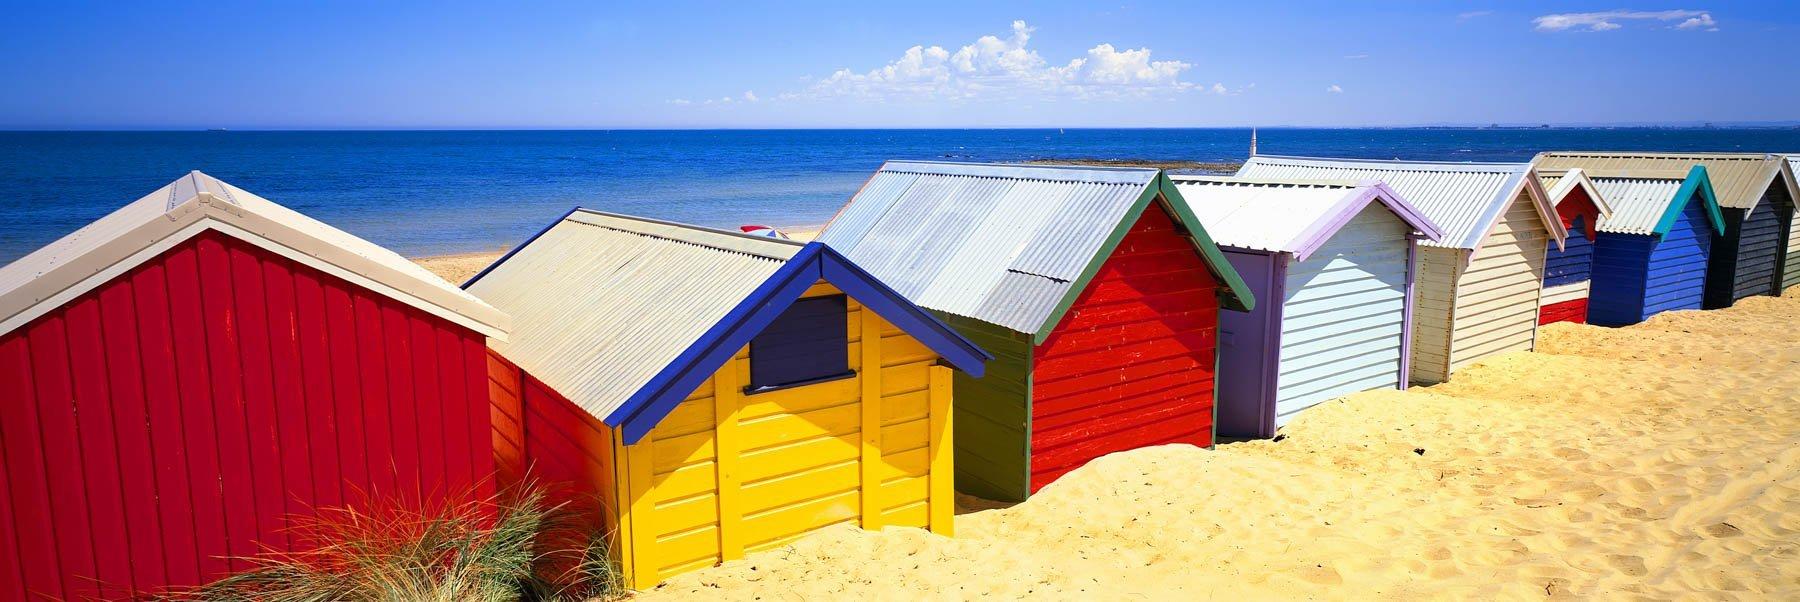 Bathing boxes (beach huts) on Brighton Beach, Melbourne, Victoria, Australia.